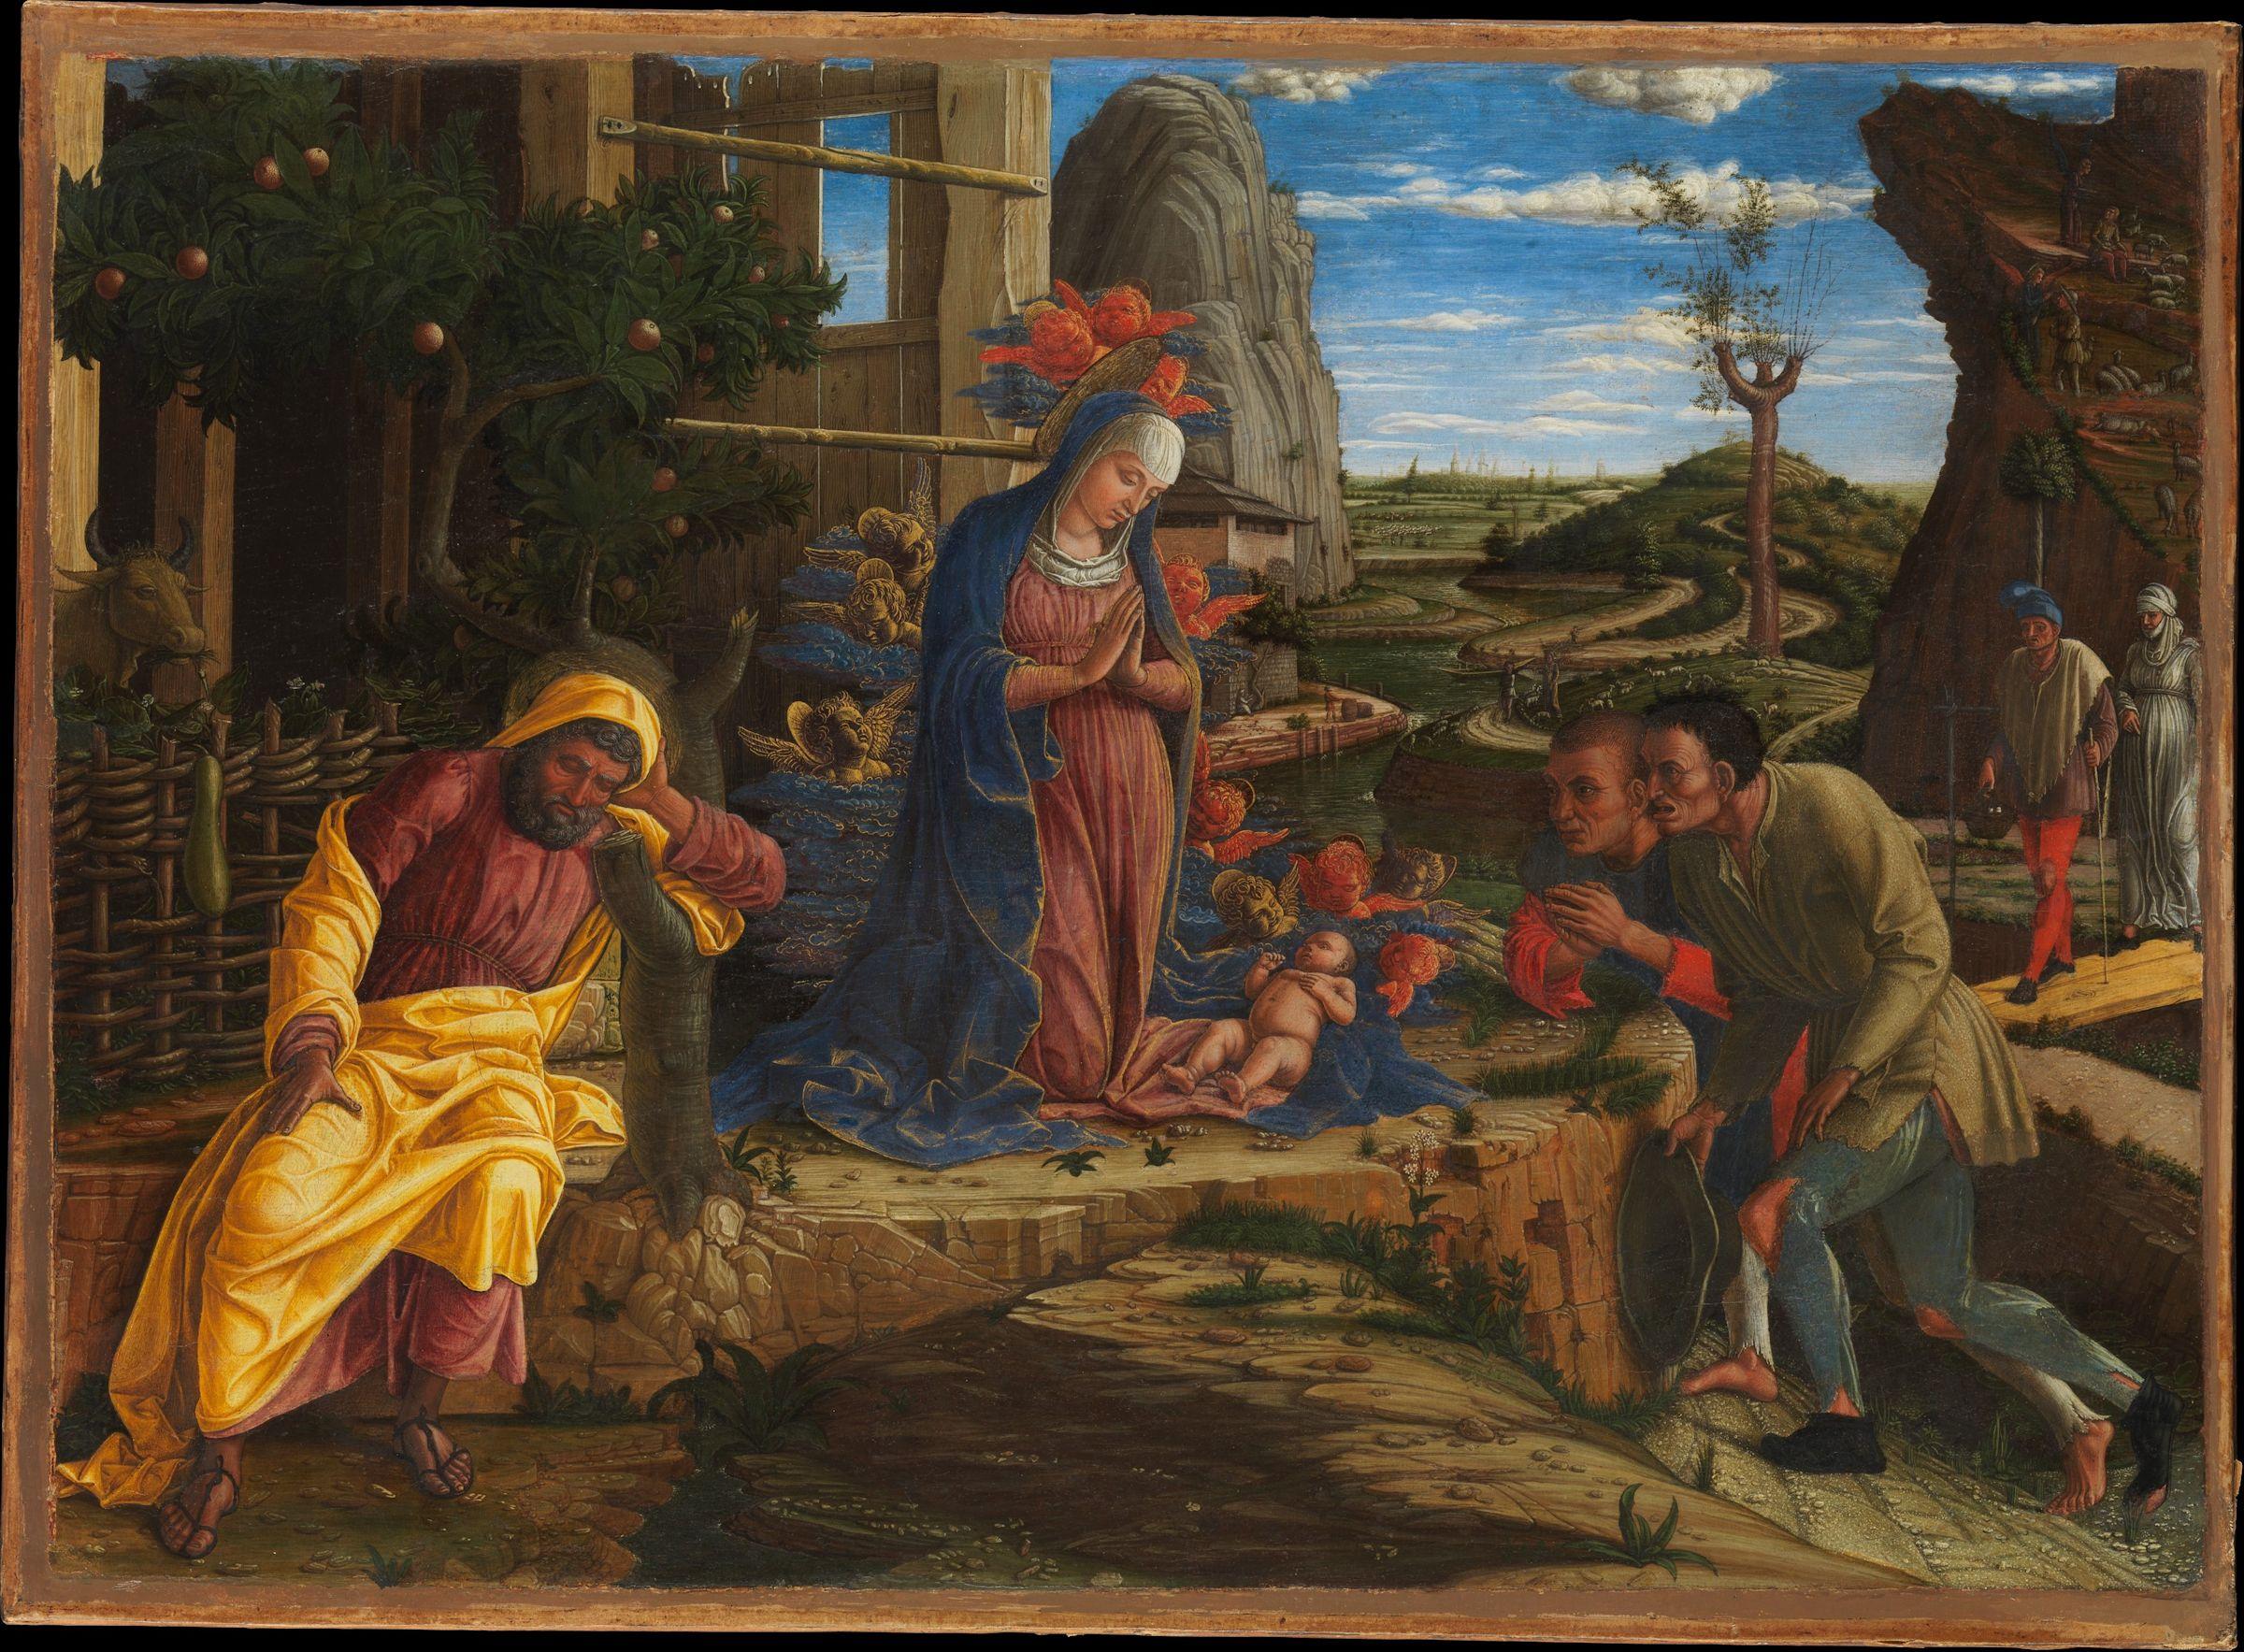 Deborah feller artist deborahfeller andrea mantegna adoration of the shepherds c 1450 tempera on canvas fandeluxe Choice Image